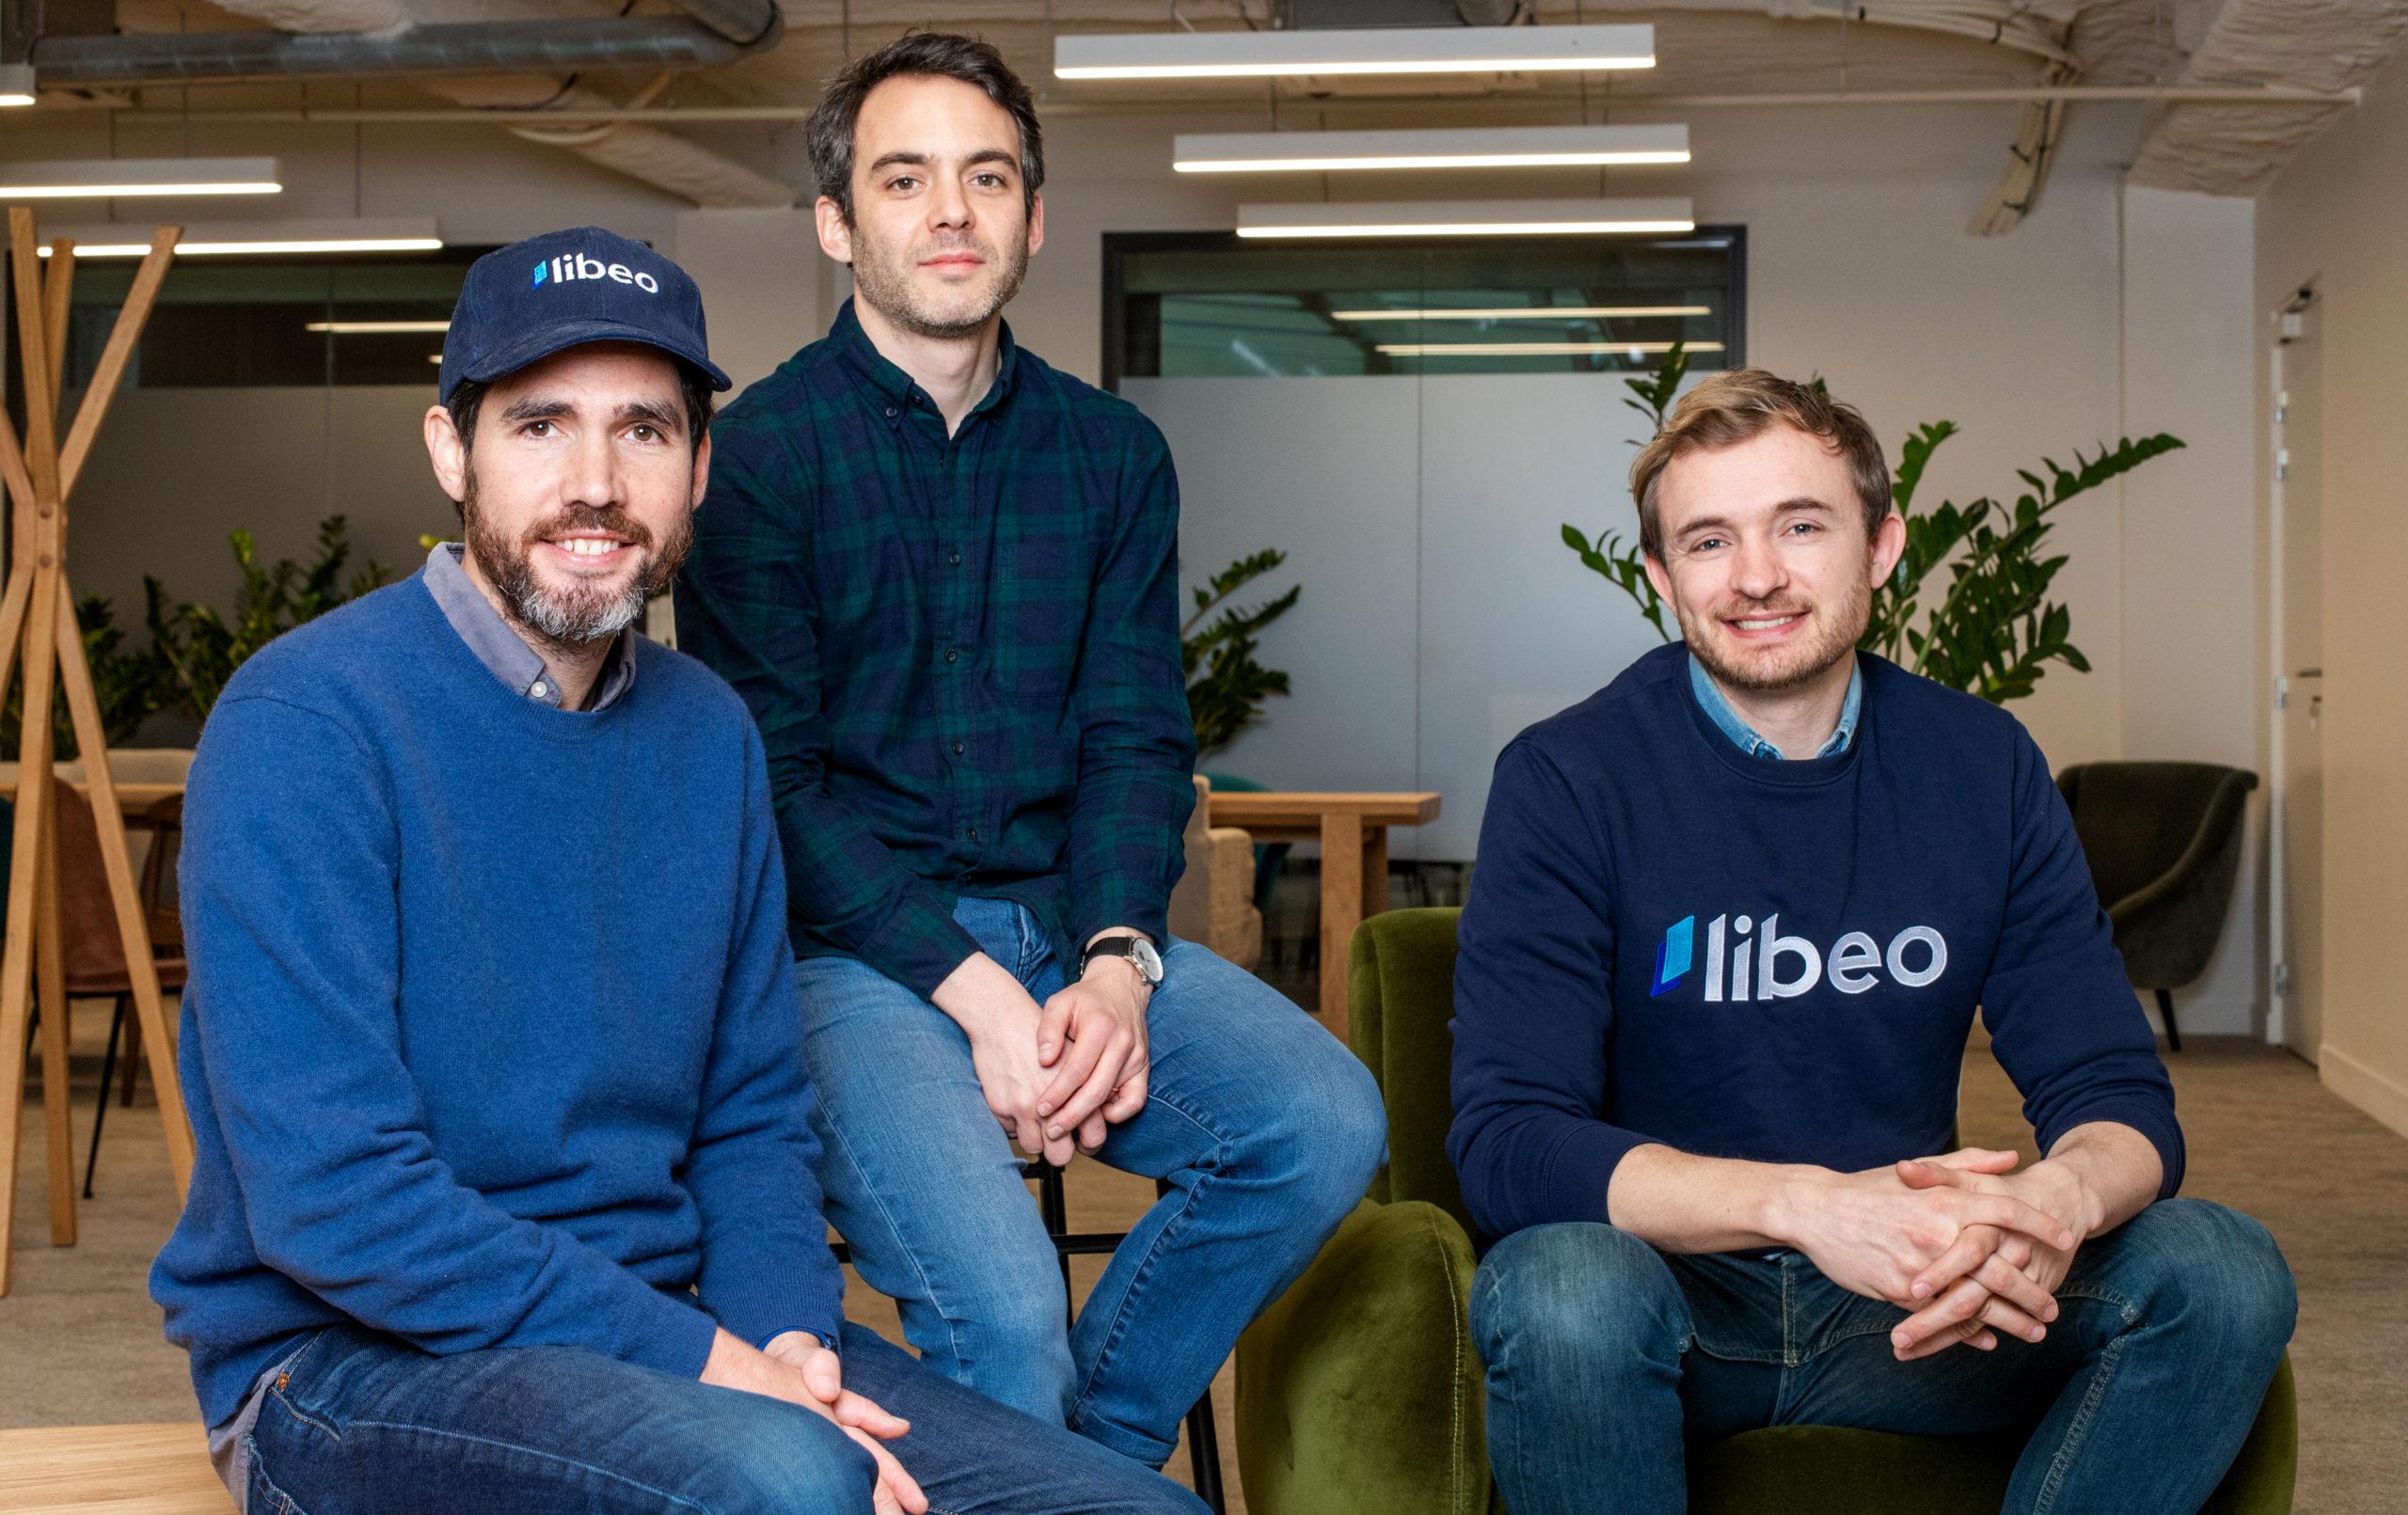 Libeo team